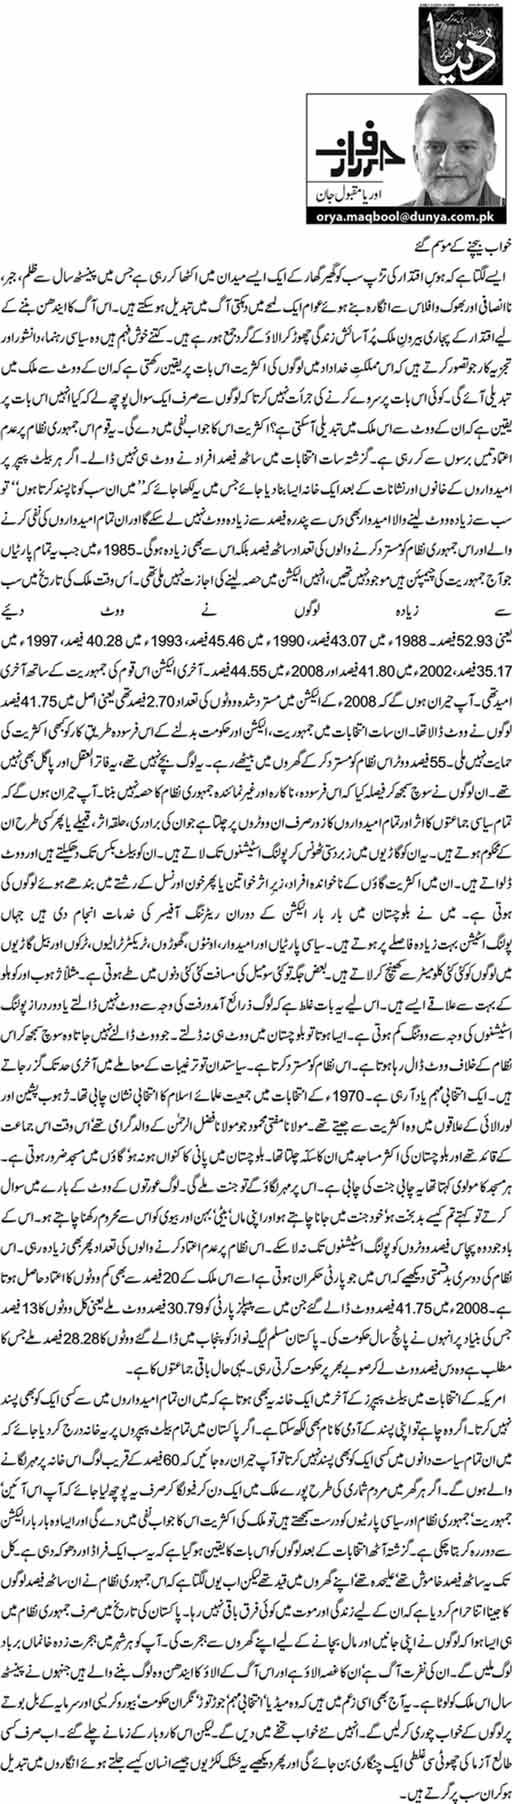 Khawab Baichne K Mosam Gay - Orya Maqbool Jan